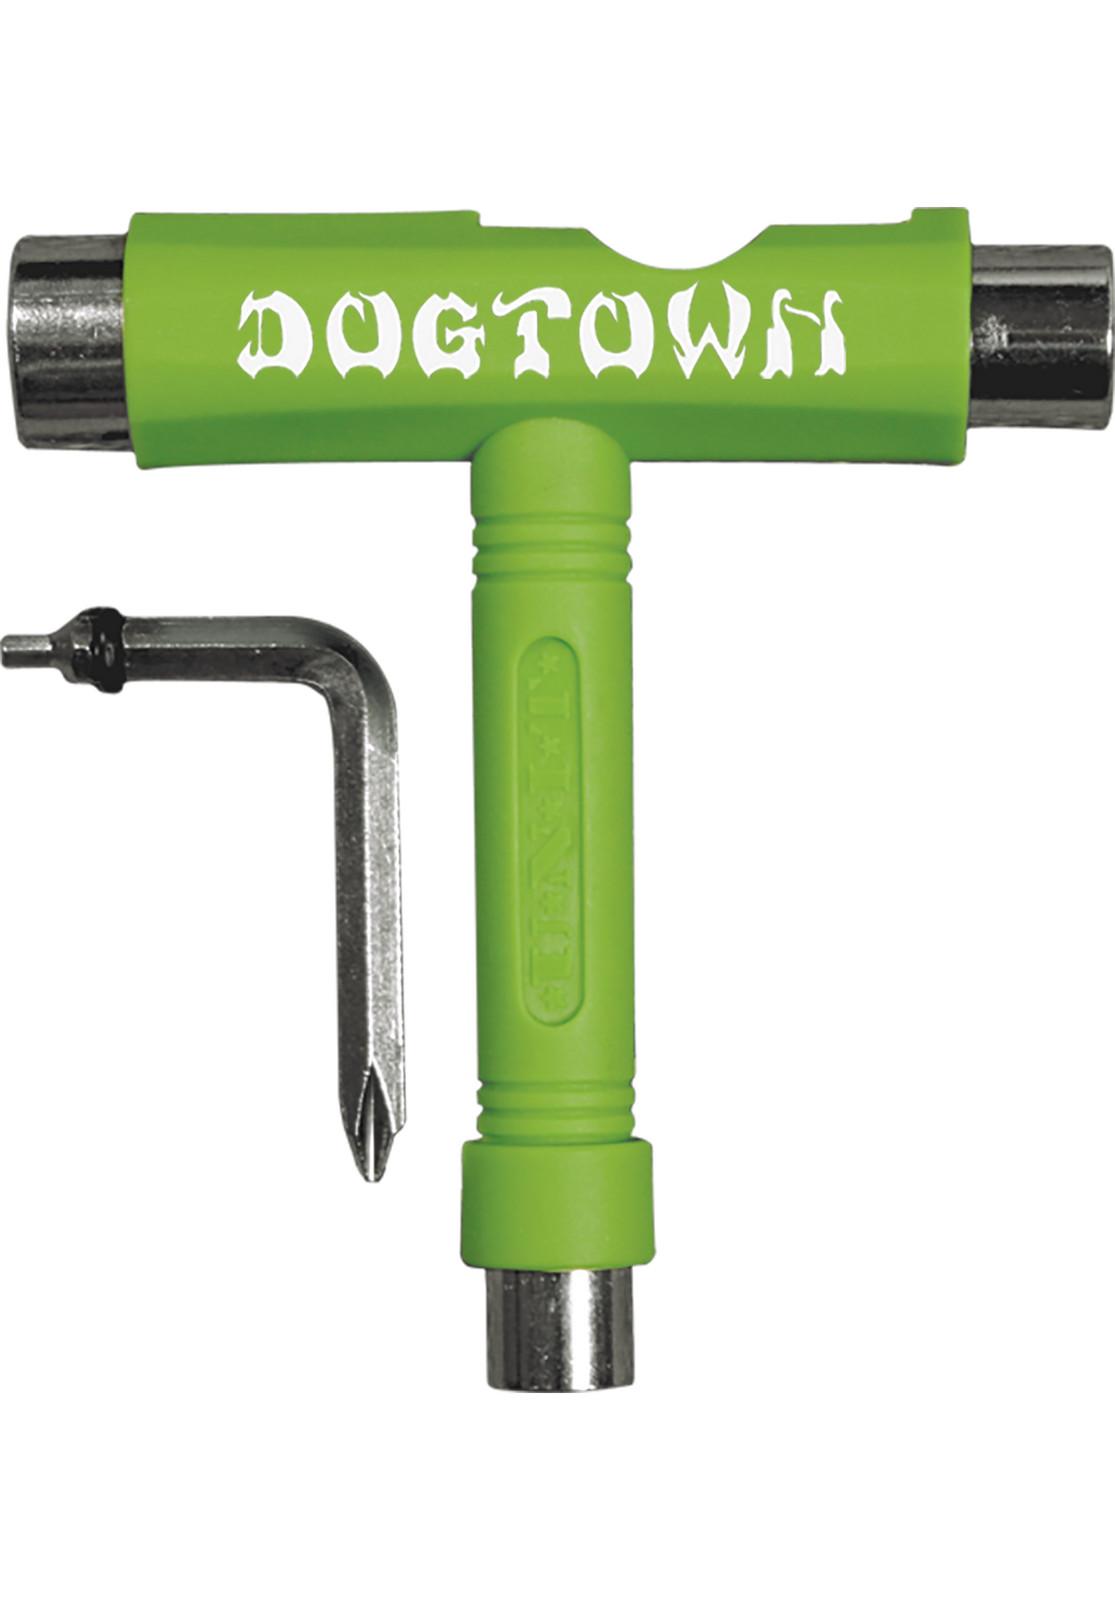 dogtown skatetool